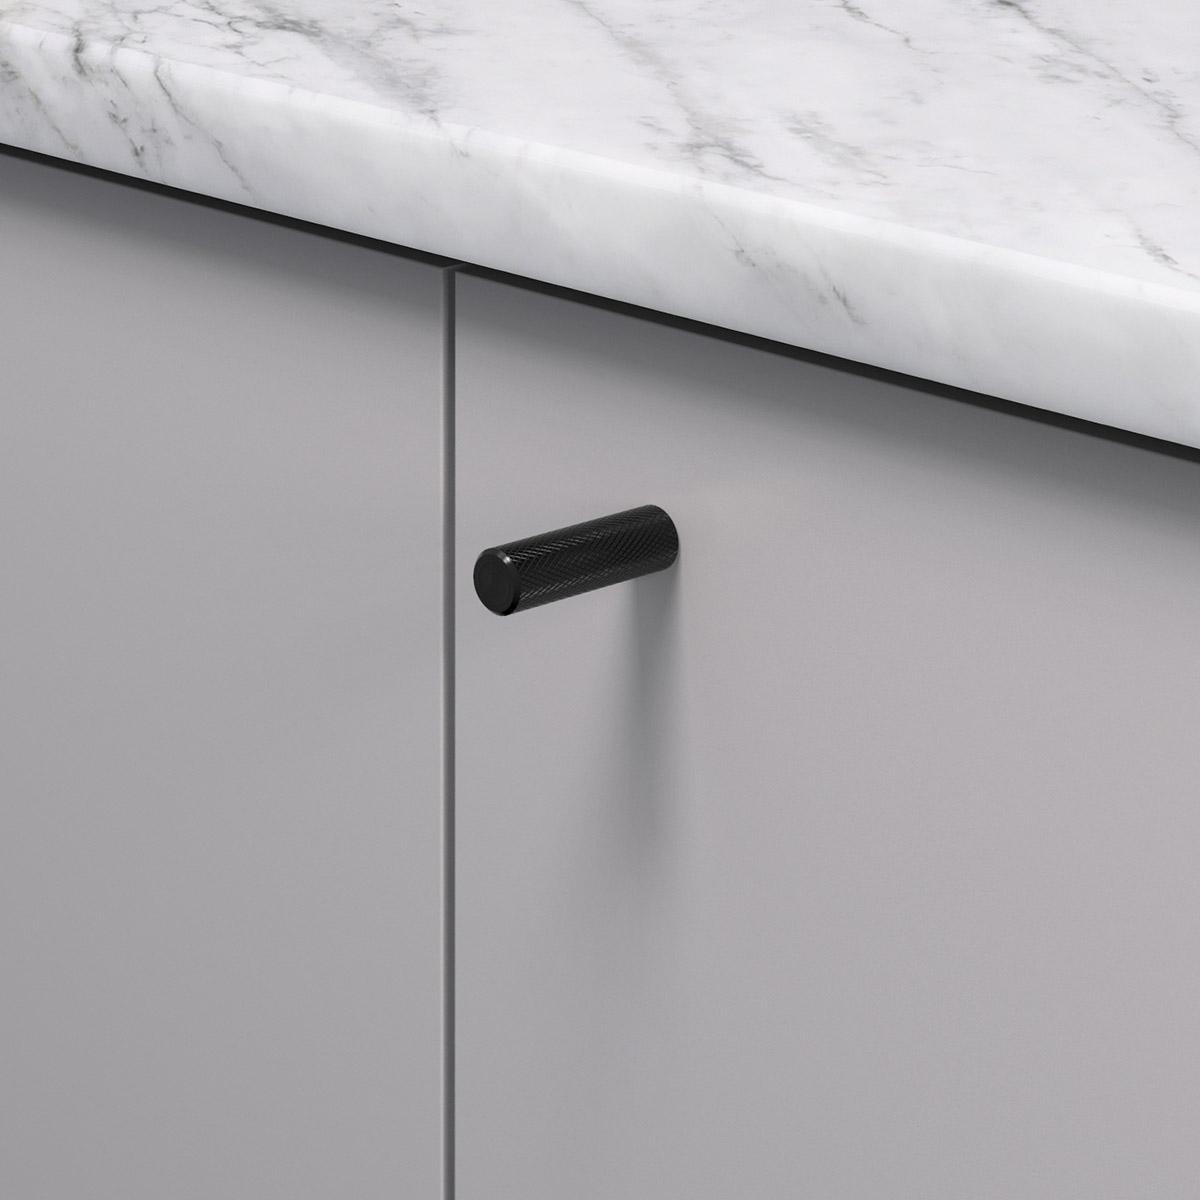 Knopp matt svart 370226 11 10 mm ncs s 4500 n marmor carrara